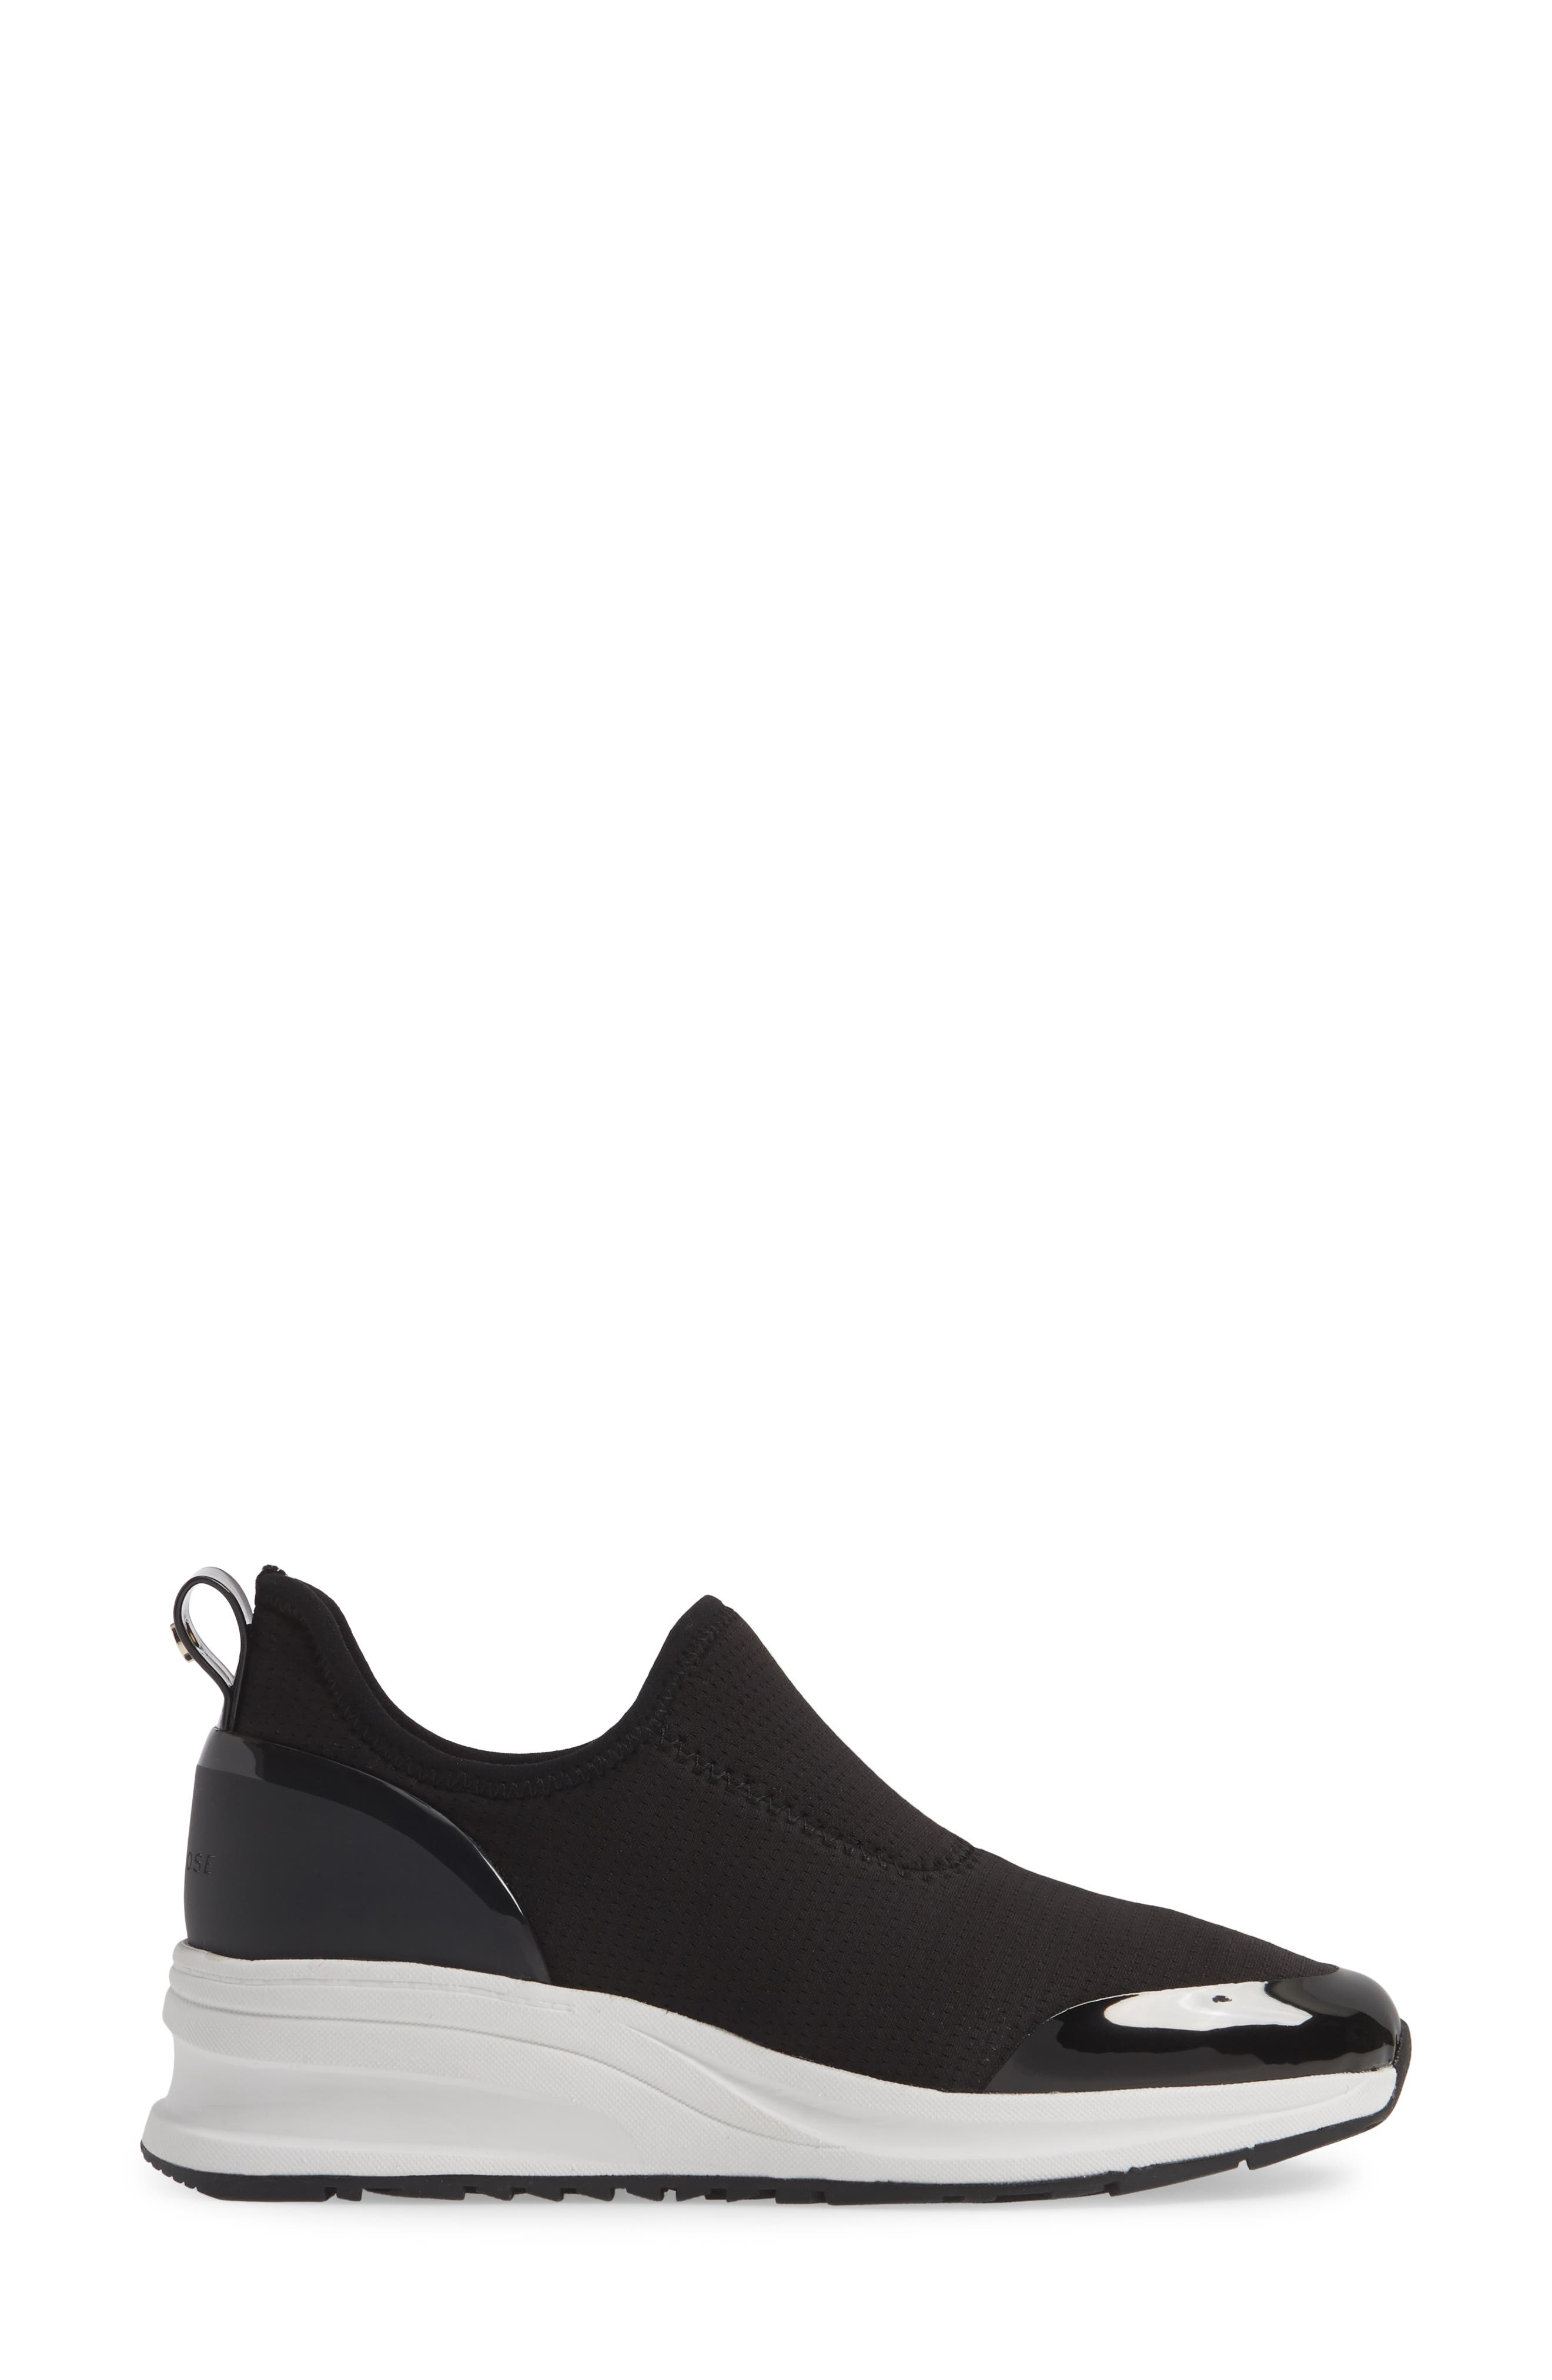 TARYN ROSE, Zabella Slip-On Sneaker, Alternate thumbnail 3, color, BLACK STRETCH FABRIC